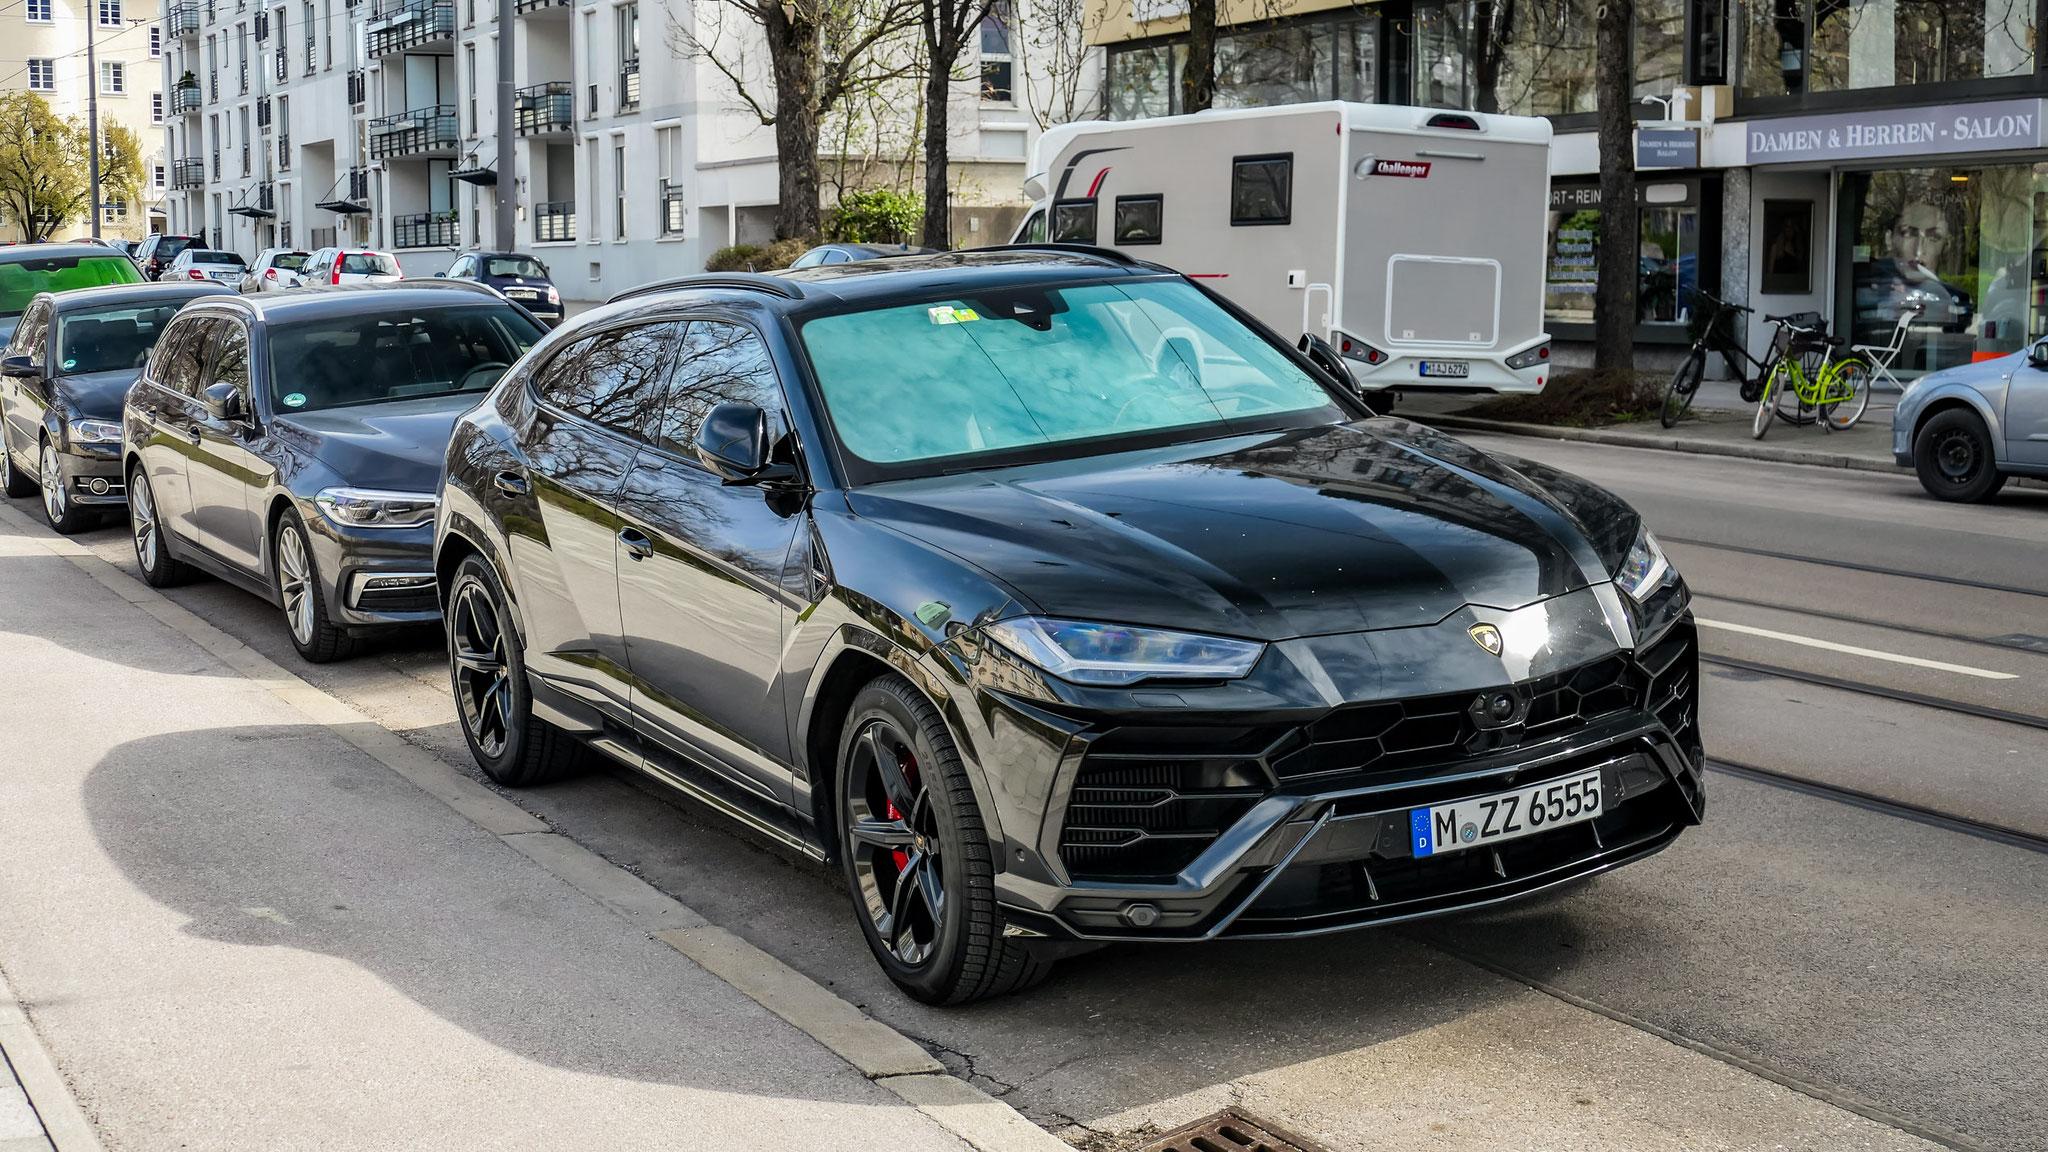 Lamborghini Urus - M-ZZ-6555